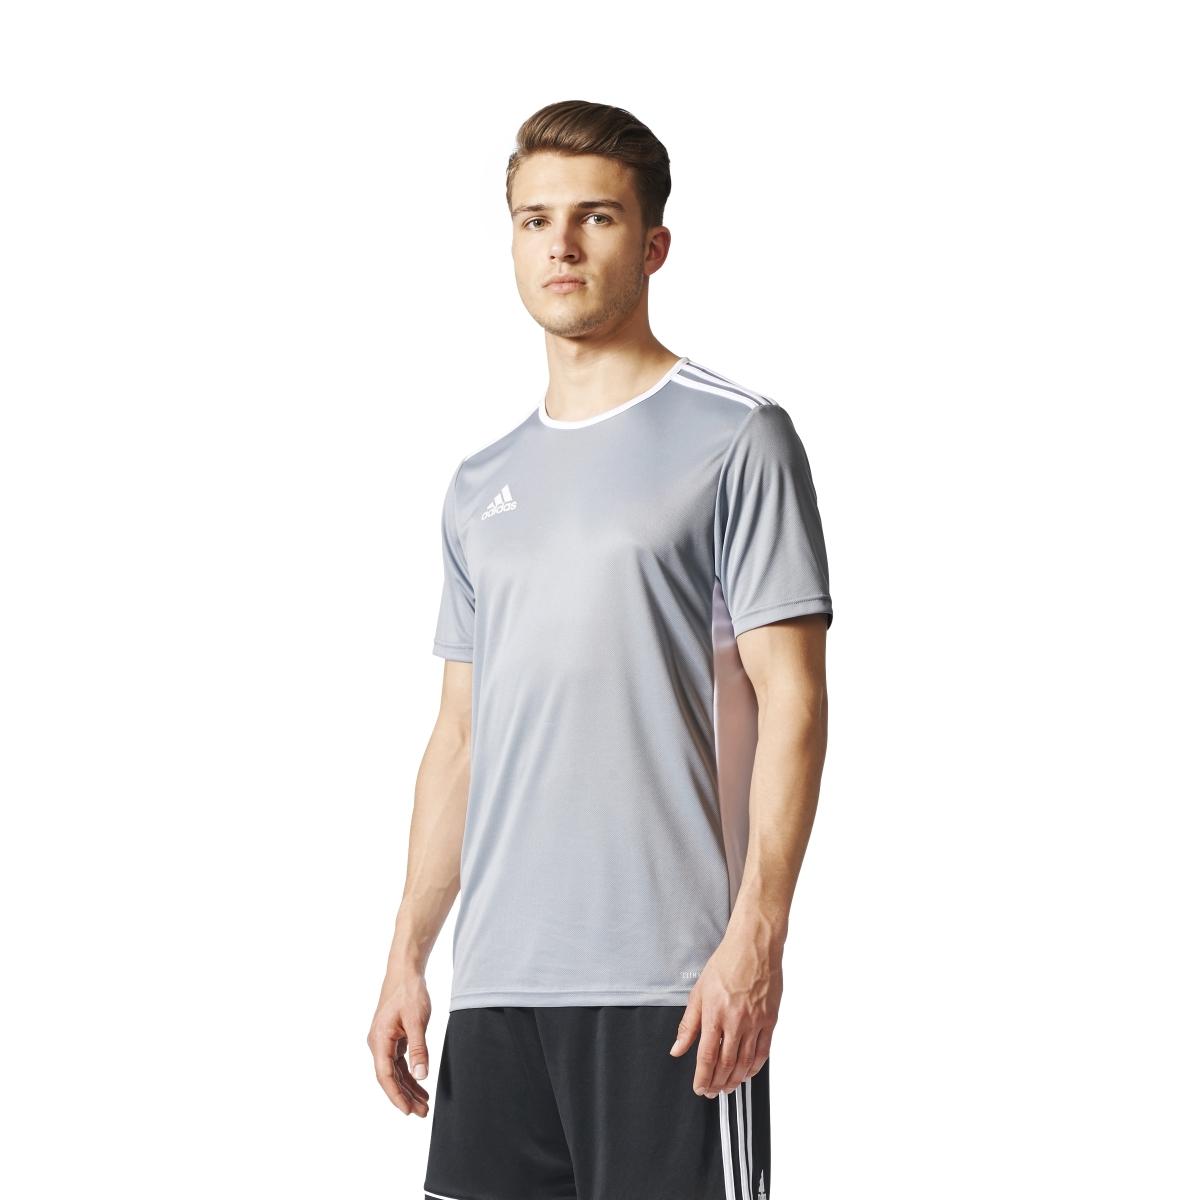 on sale wide range a few days away Adidas Entrada 18 Jersey